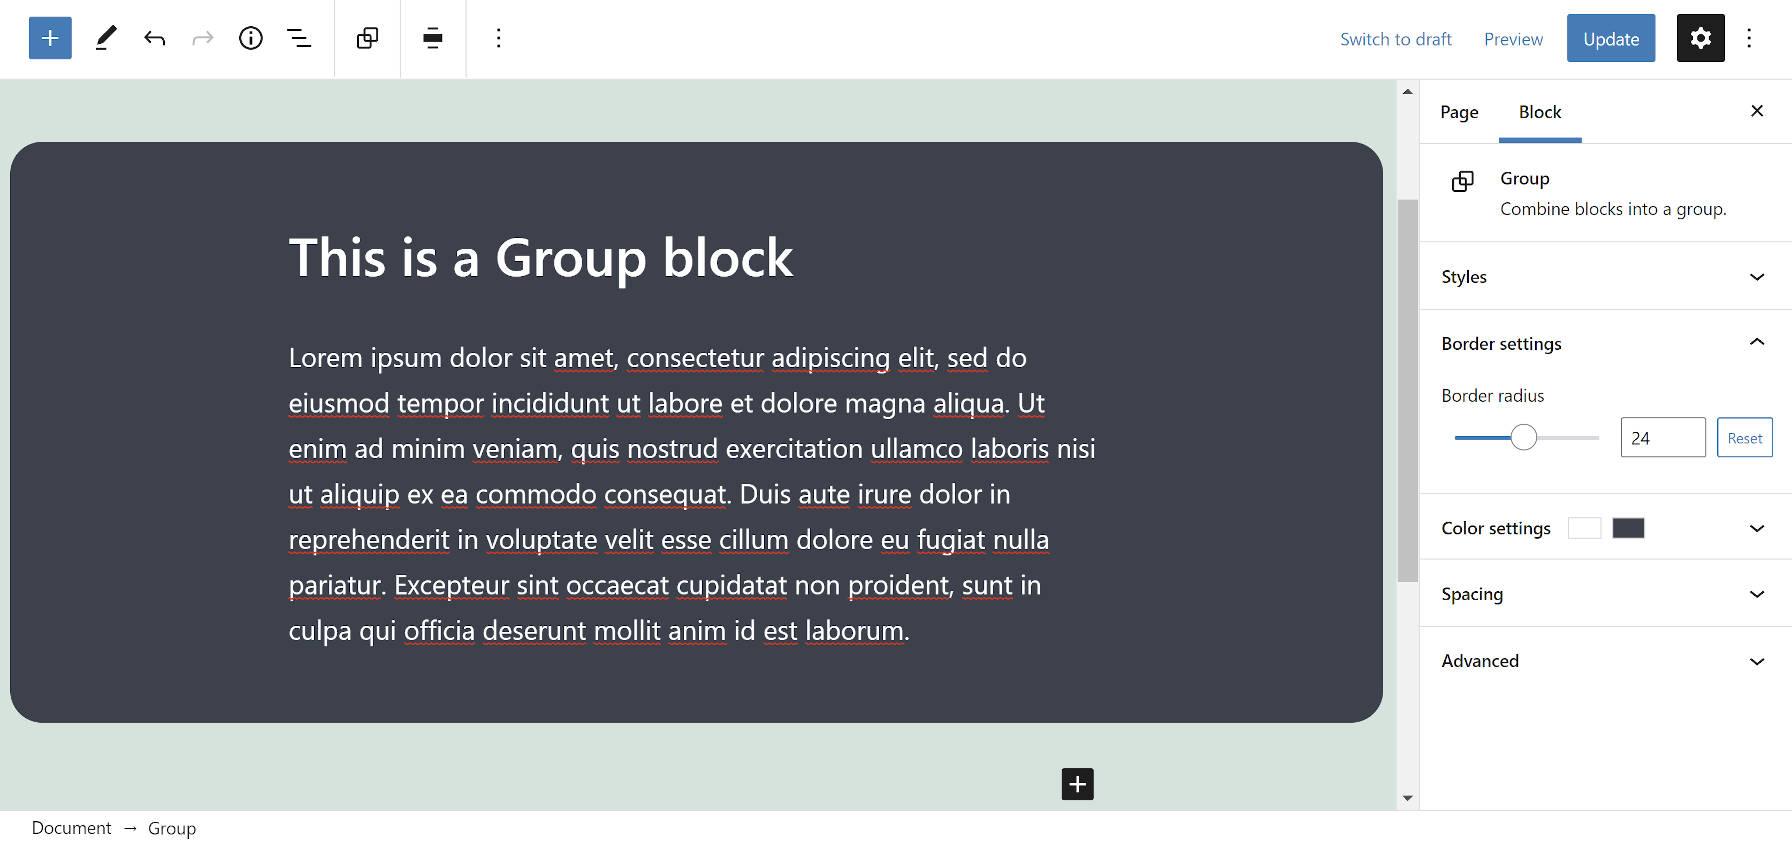 "gutenberg-9-8将圆角边框带到组块中,然后将现场编辑器画布移动到嵌入式框架2中Gutenberg 9.8将圆角边框带到组块中并将""站点编辑器""画布移动到嵌入式框架中"